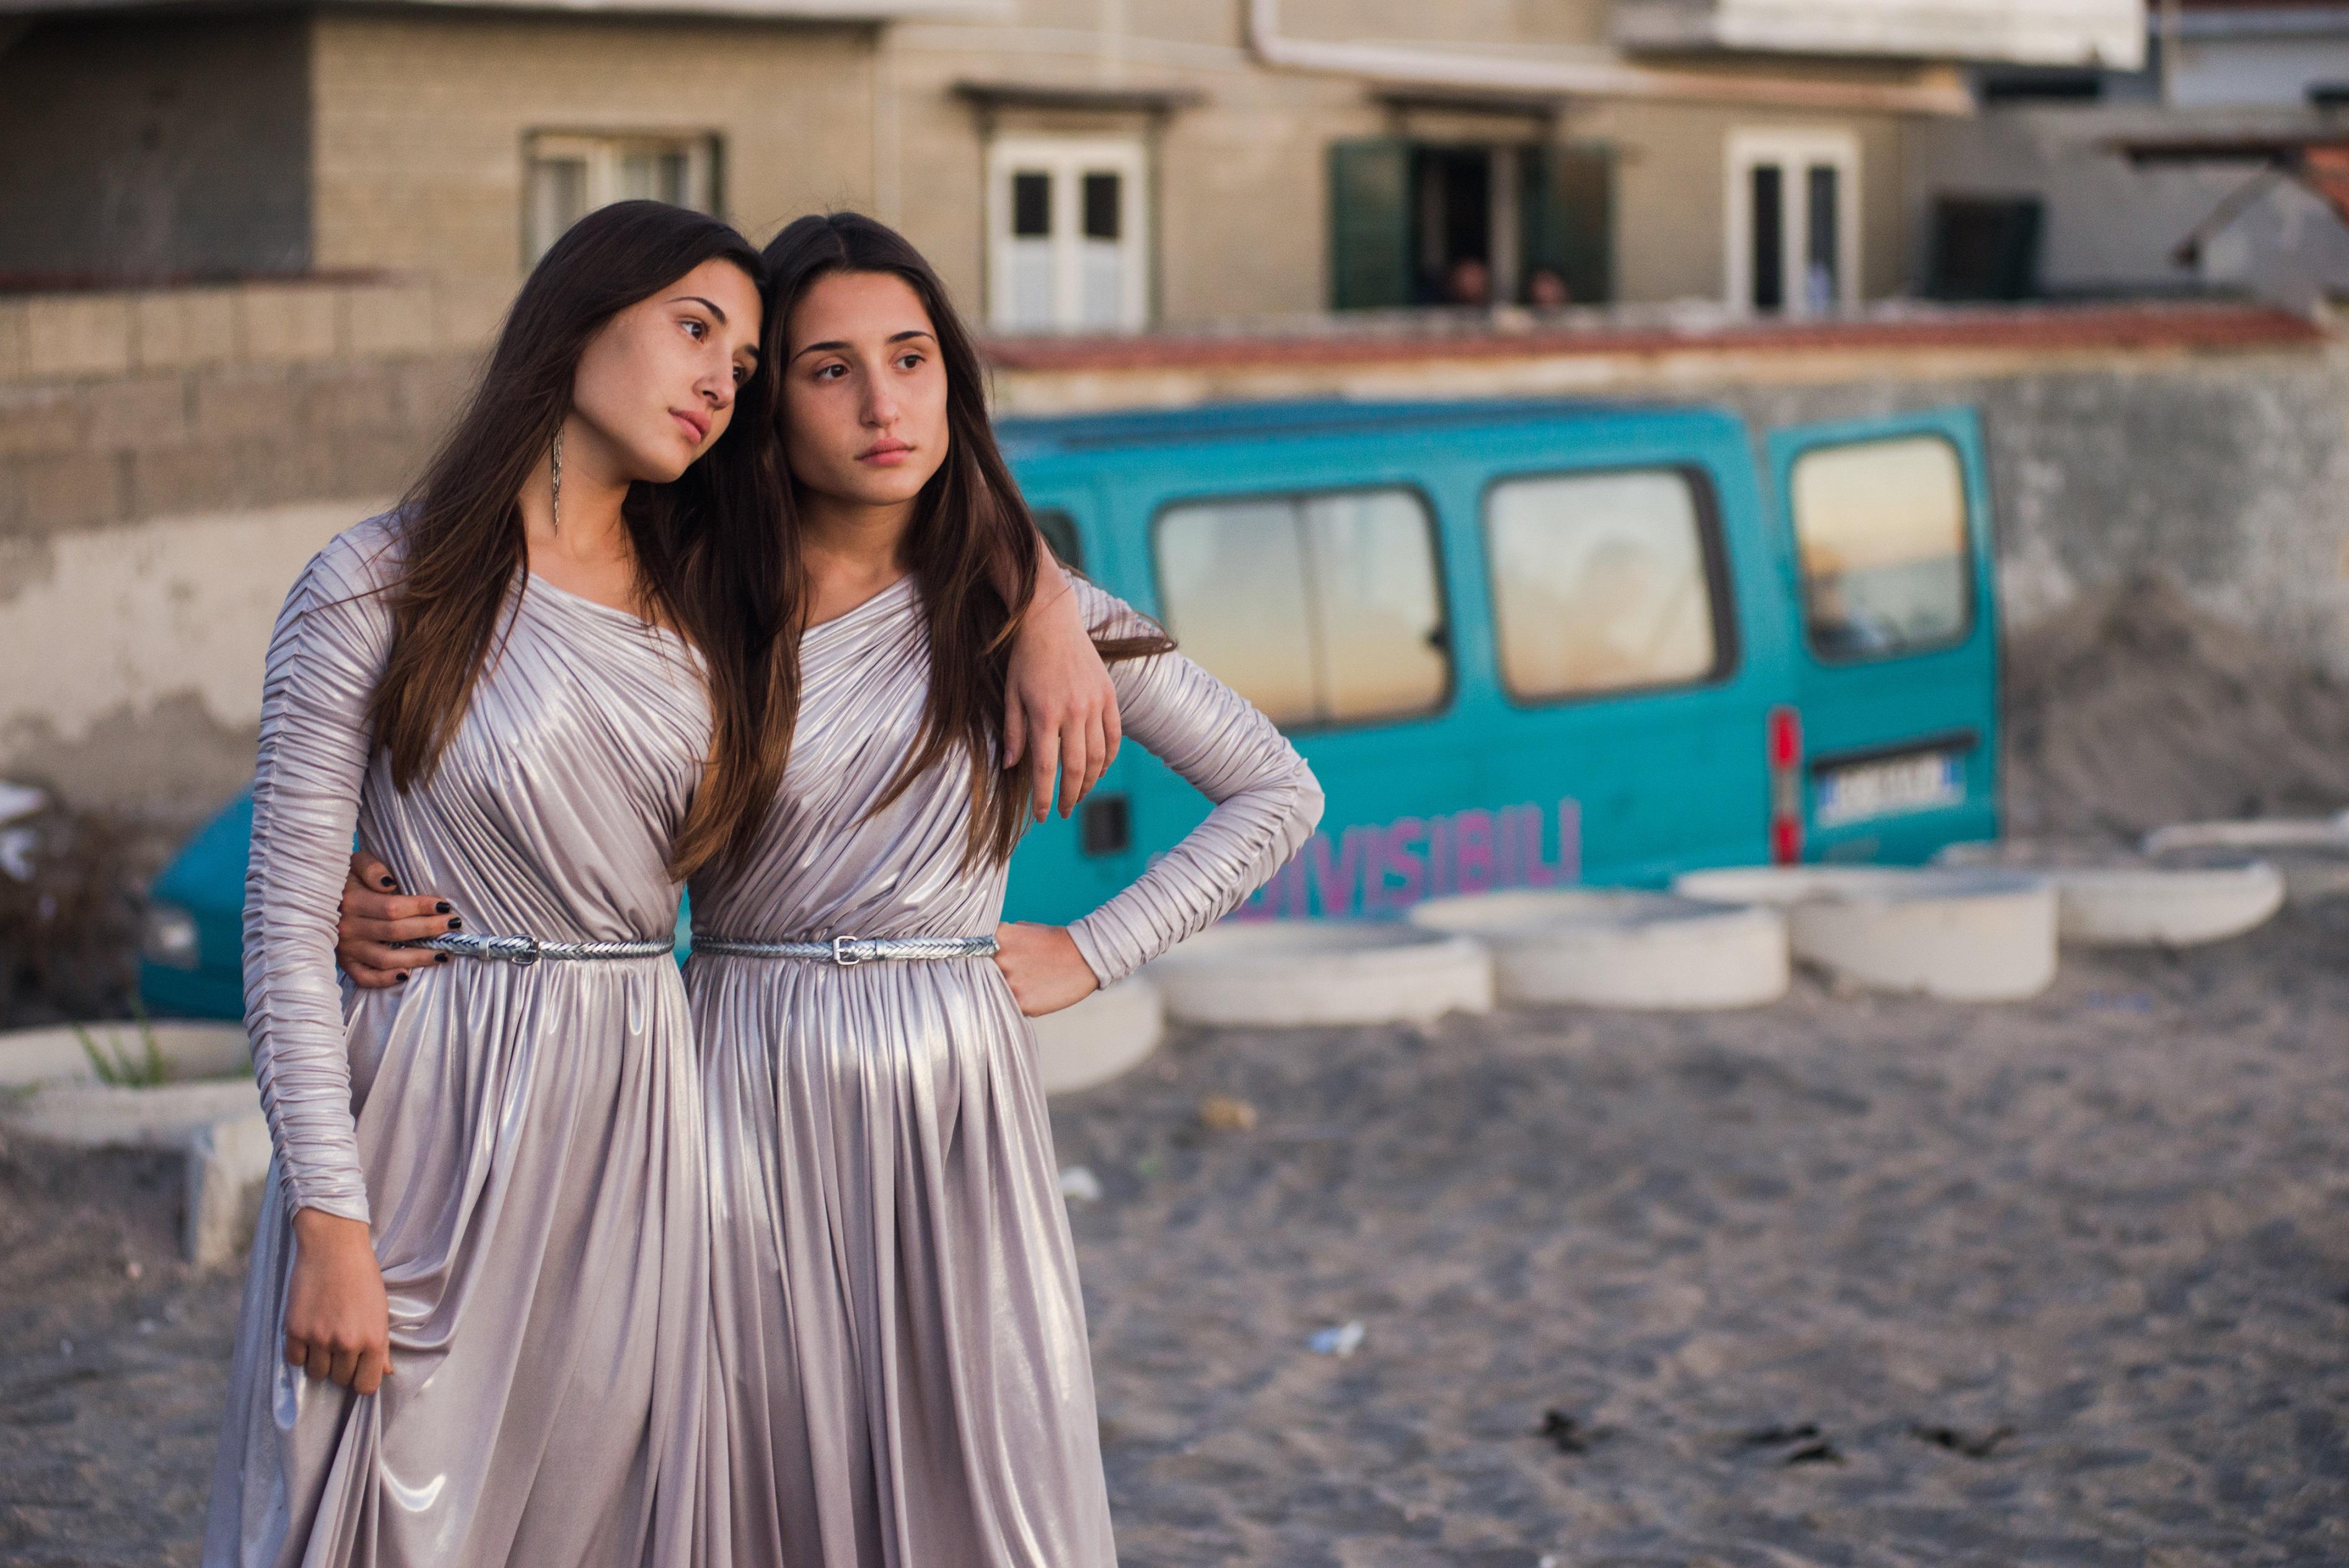 Indivisibili di Edoardo De Angelis: videointervista a Marianna e Angela Fontana